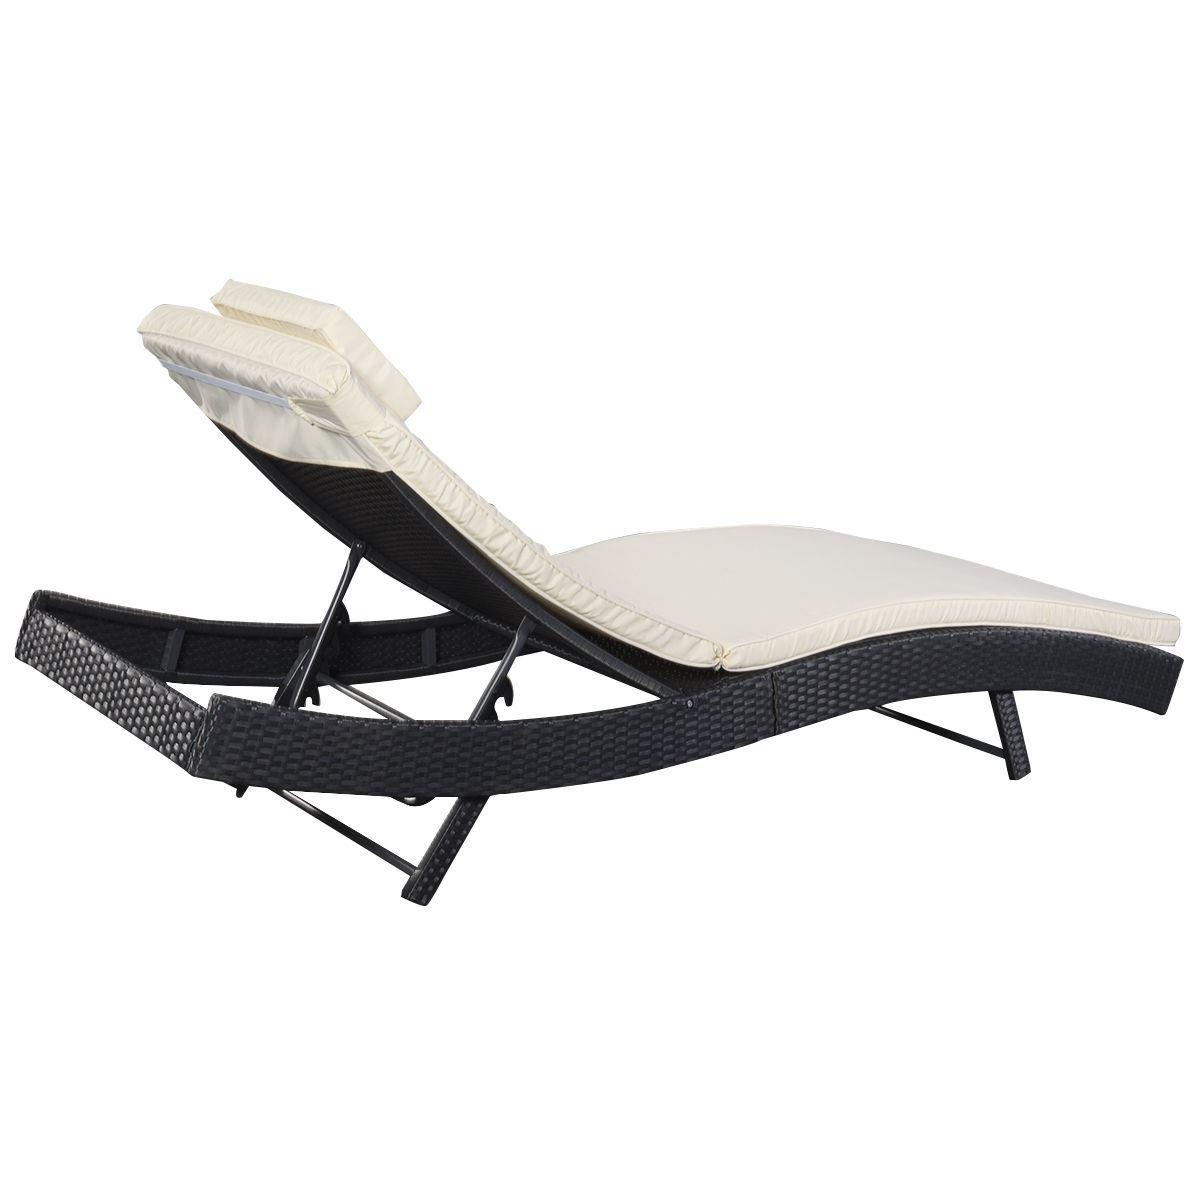 Favorite Outdoor : Target Lounge Chairs Vinyl Strap Chaise Lounge Outdoor With Regard To Vinyl Strap Chaise Lounge Chairs (View 4 of 15)